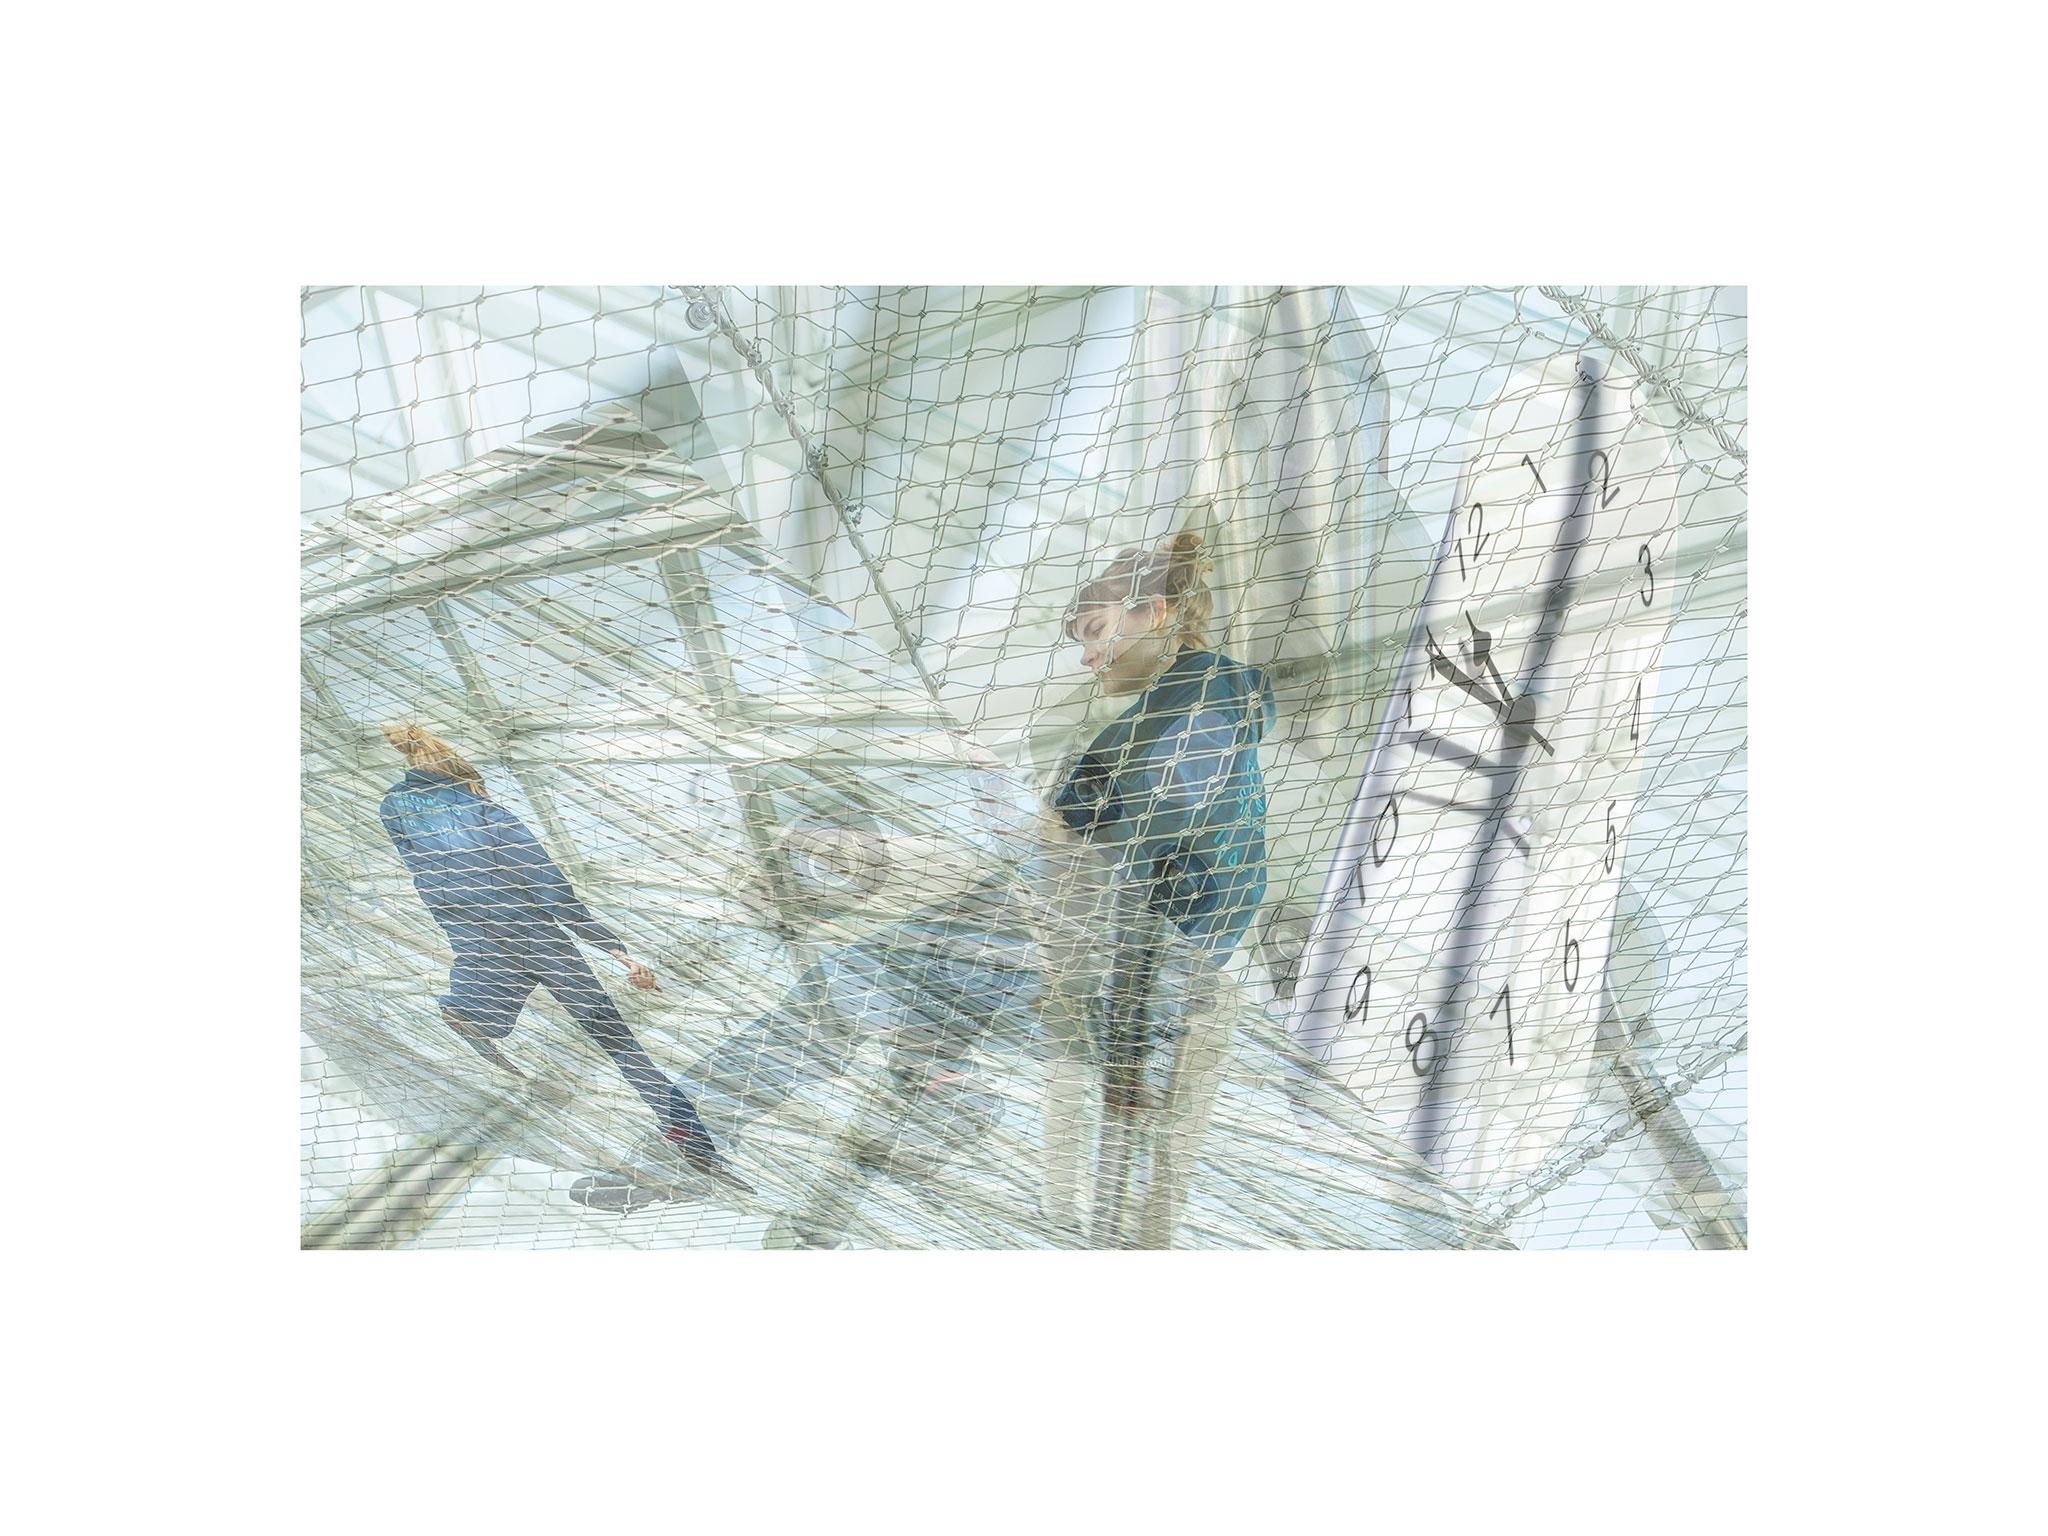 Kunstprojekt, Meditation, Wilfried Malkusch